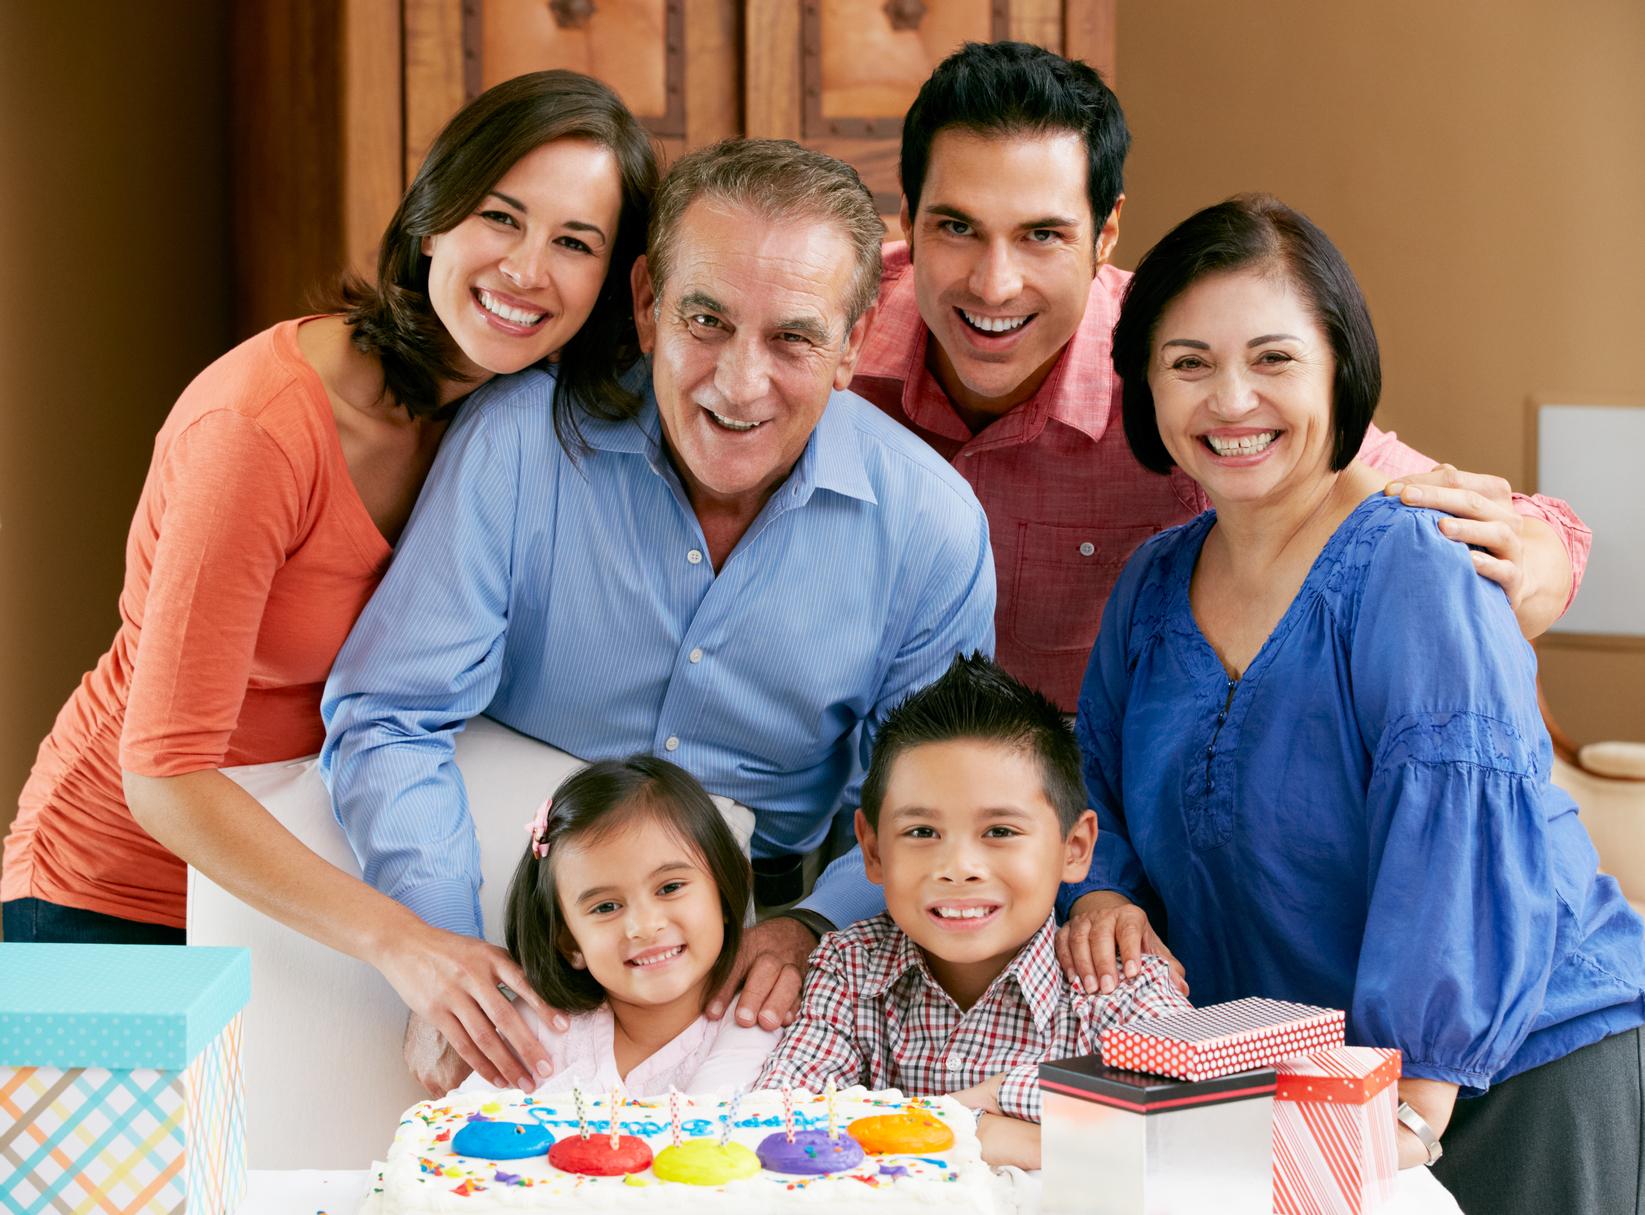 Longevity revolution_Multi-Generation Family Celebrating - Dollar photo club